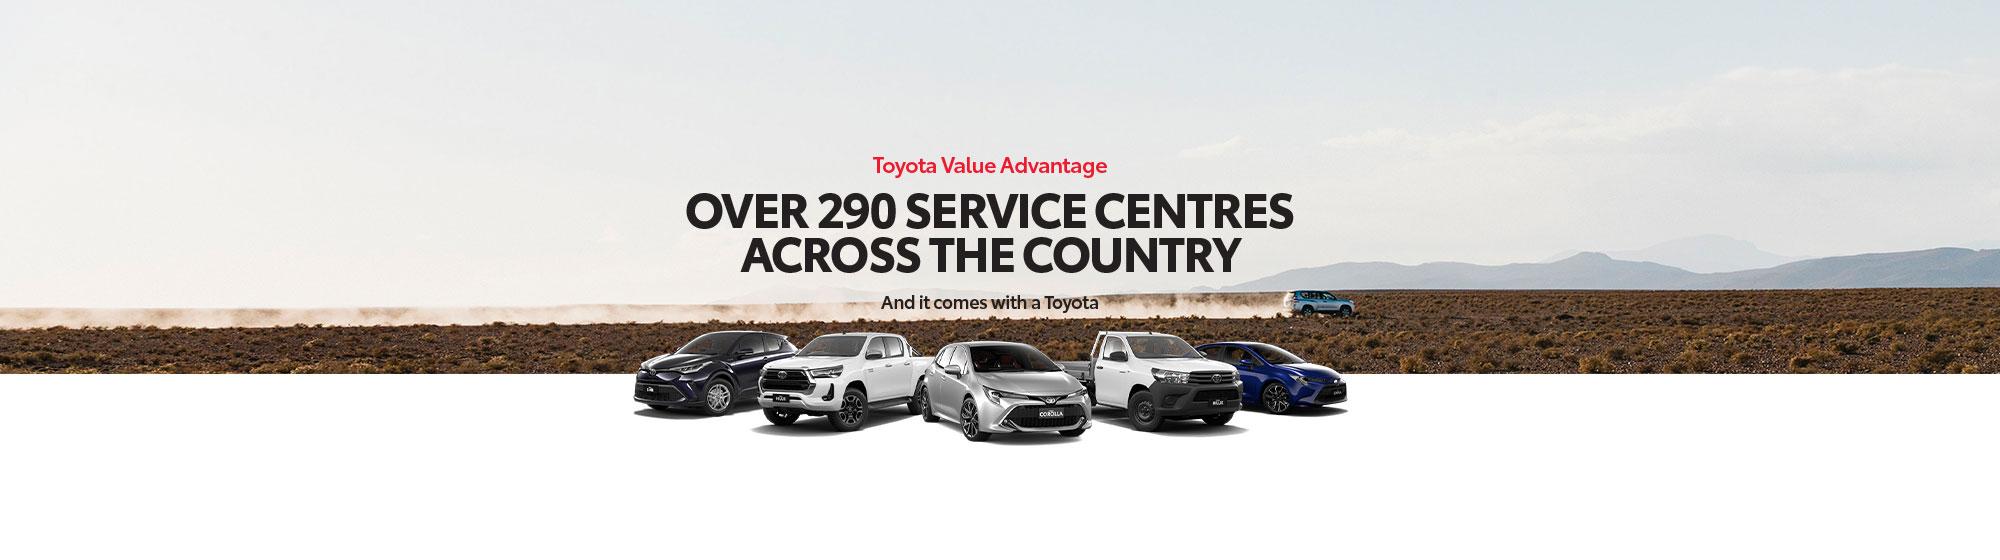 Toyota Special 2000x560